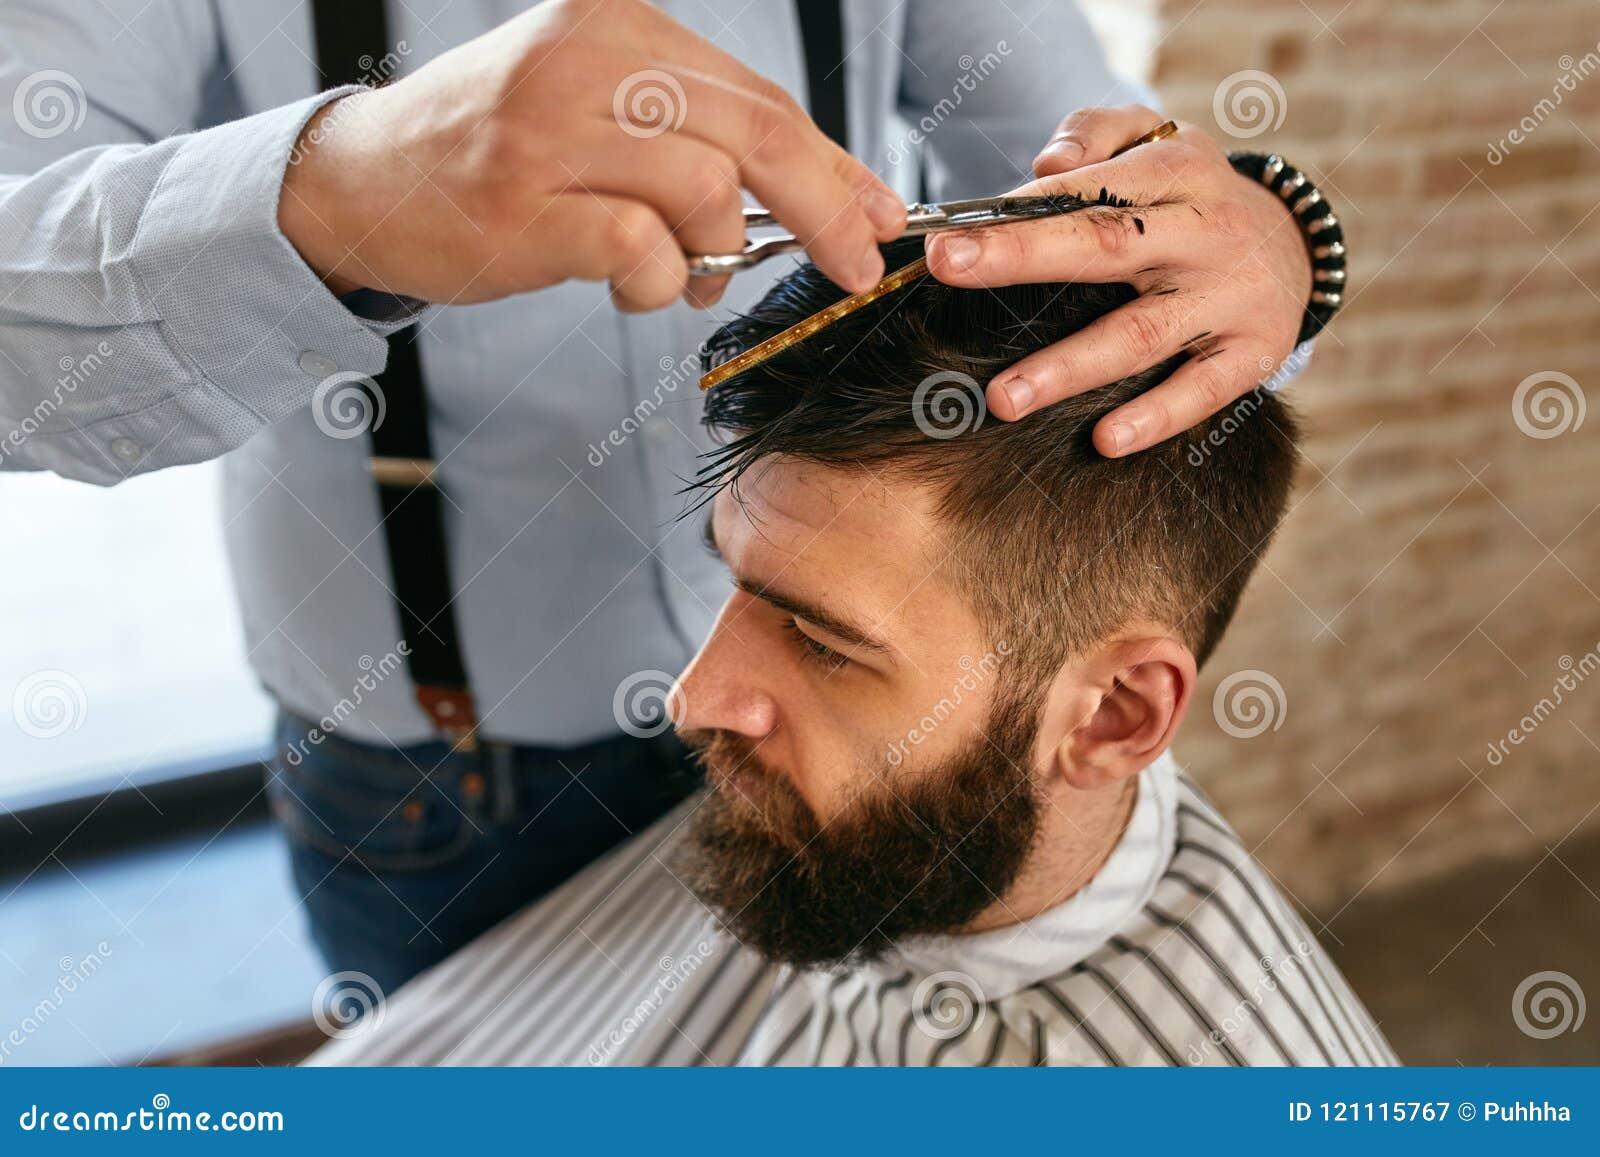 Men Haircut. Barber Cutting Man`s Hair In Barber Shop Stock Image